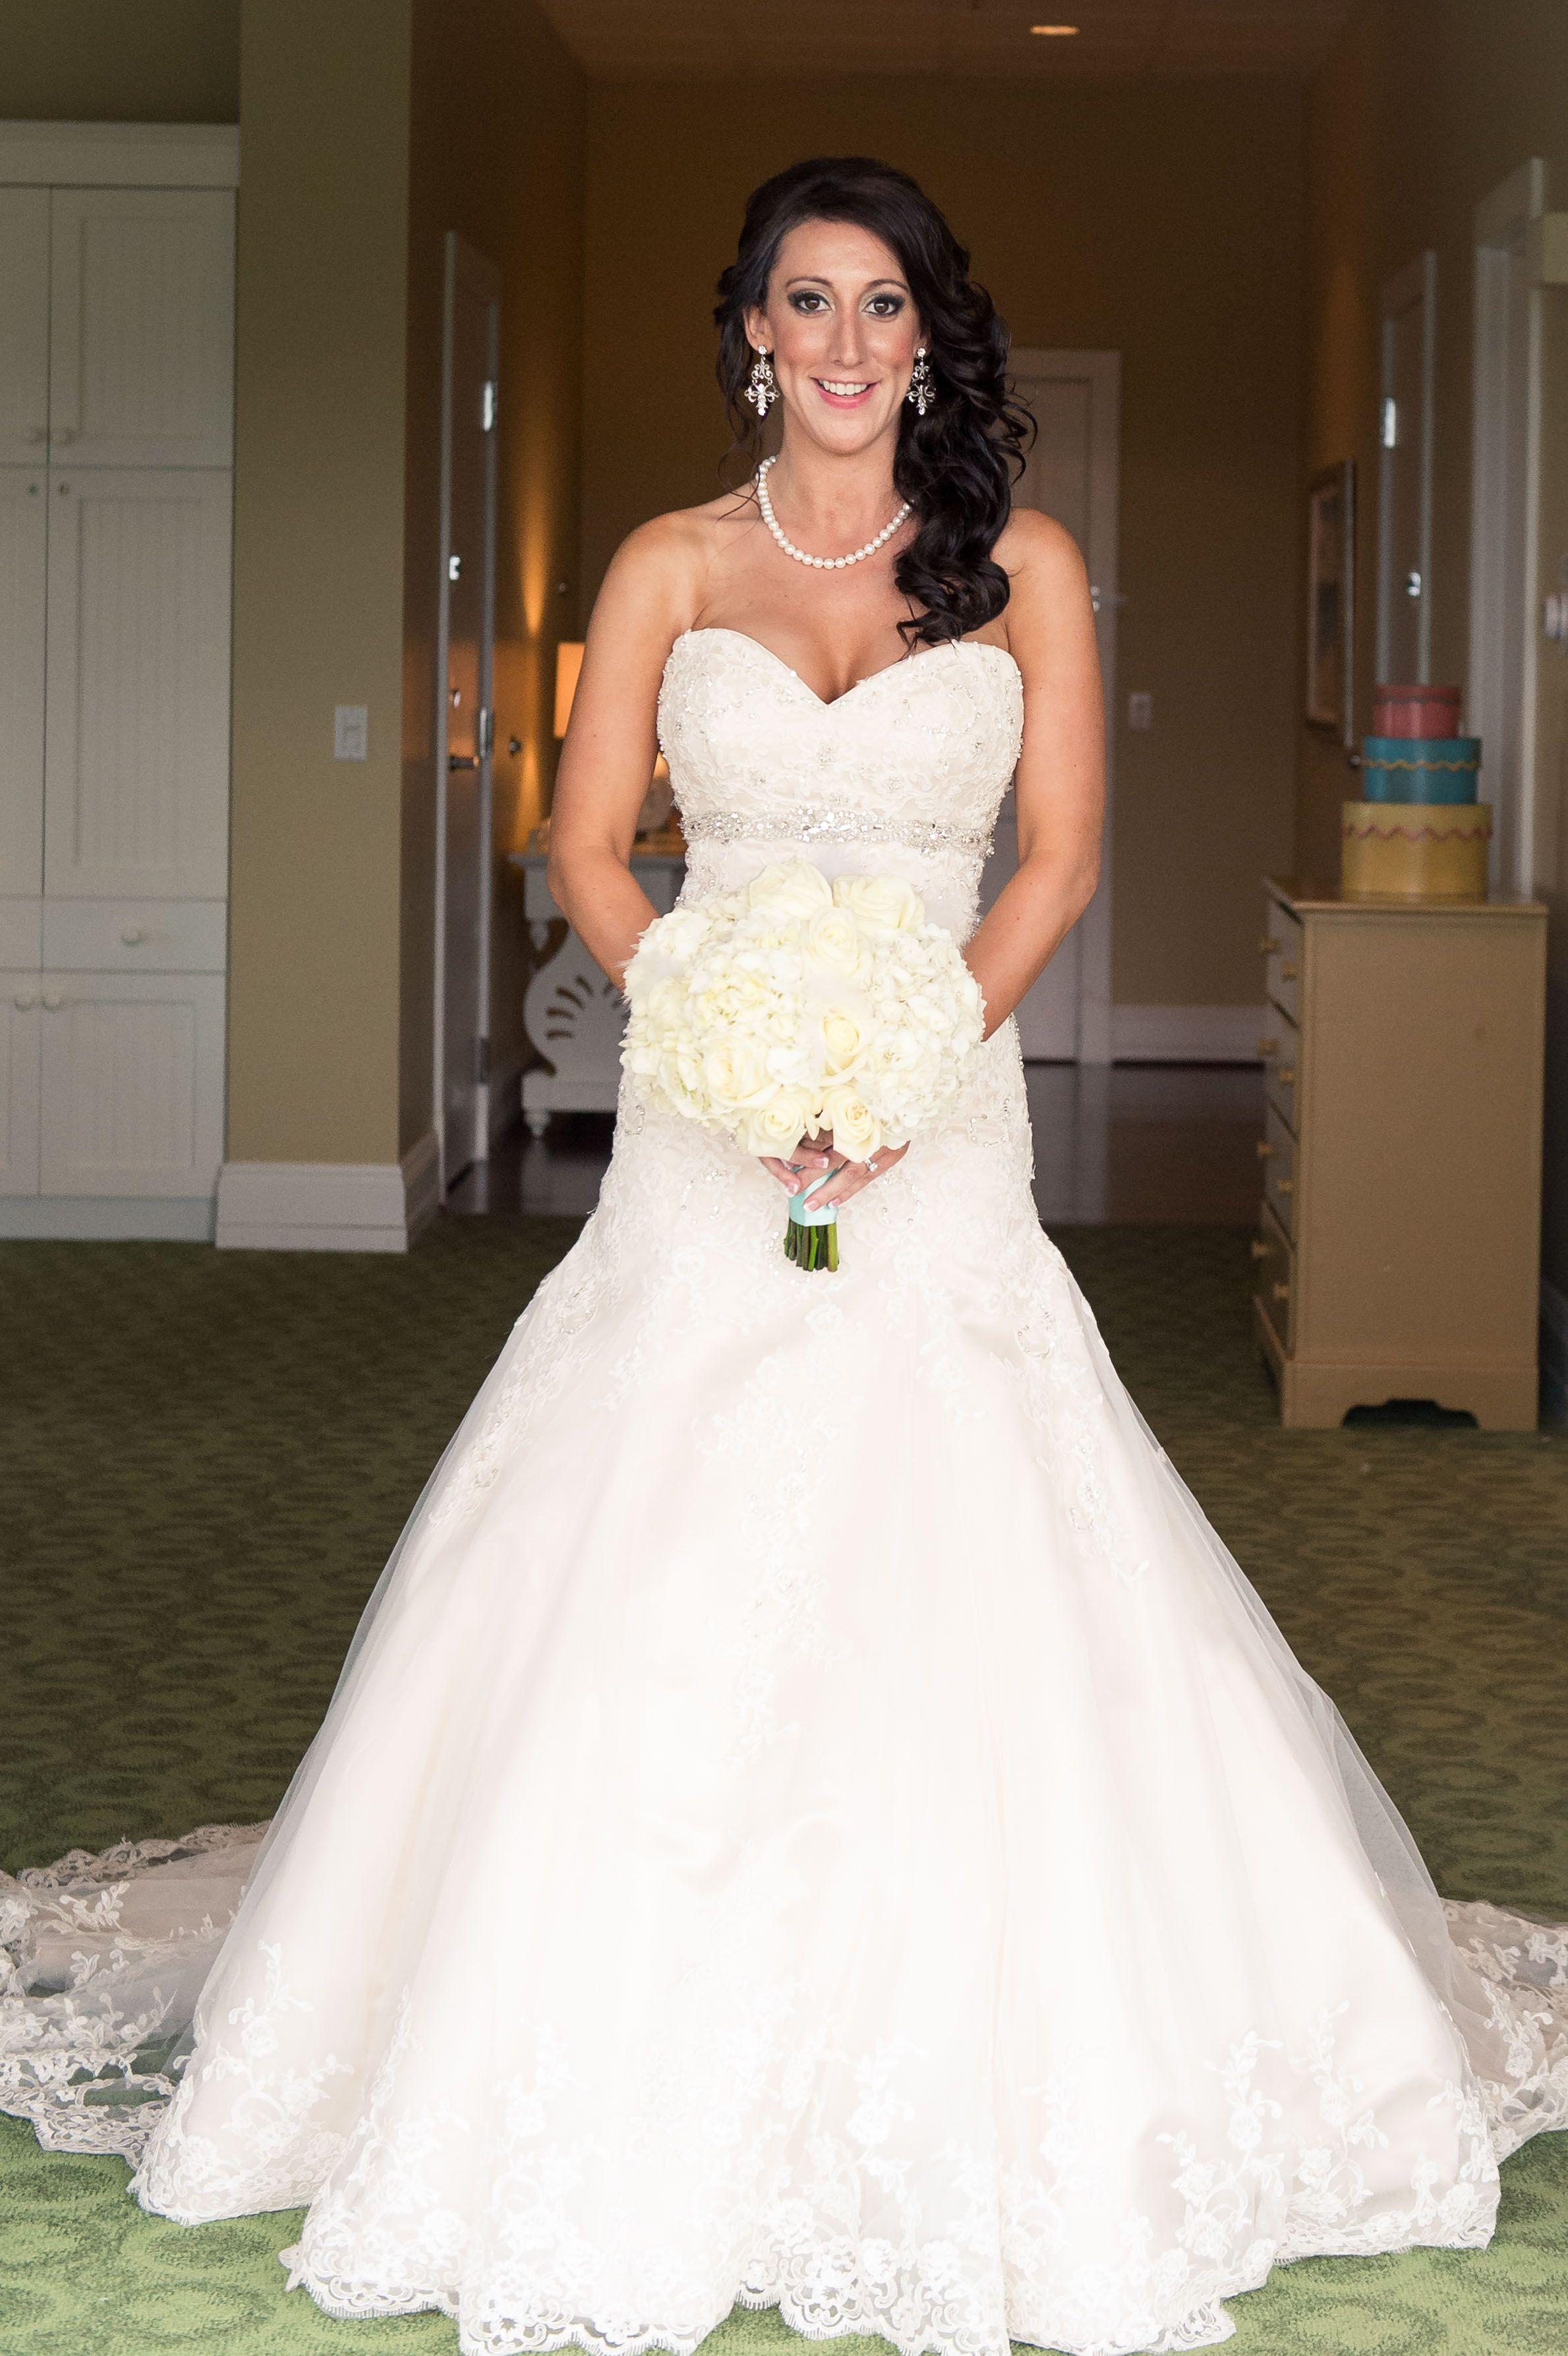 Hayley paige dori wedding dress  Pin by Luna on vestidos de novia  Pinterest  Wedding and Weddings